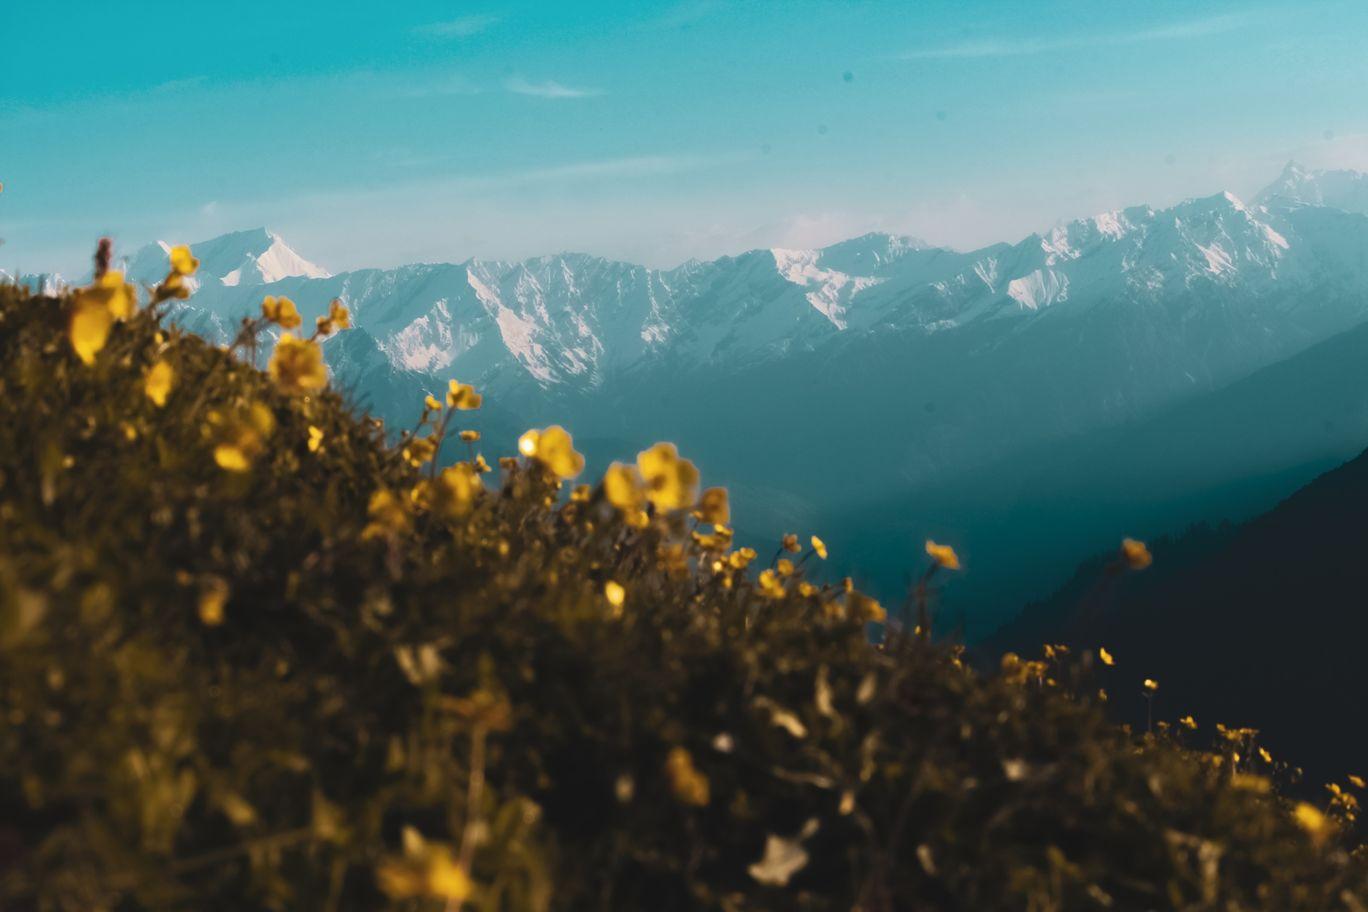 Photo of Chanderkhani Pass By Sourav Mahant